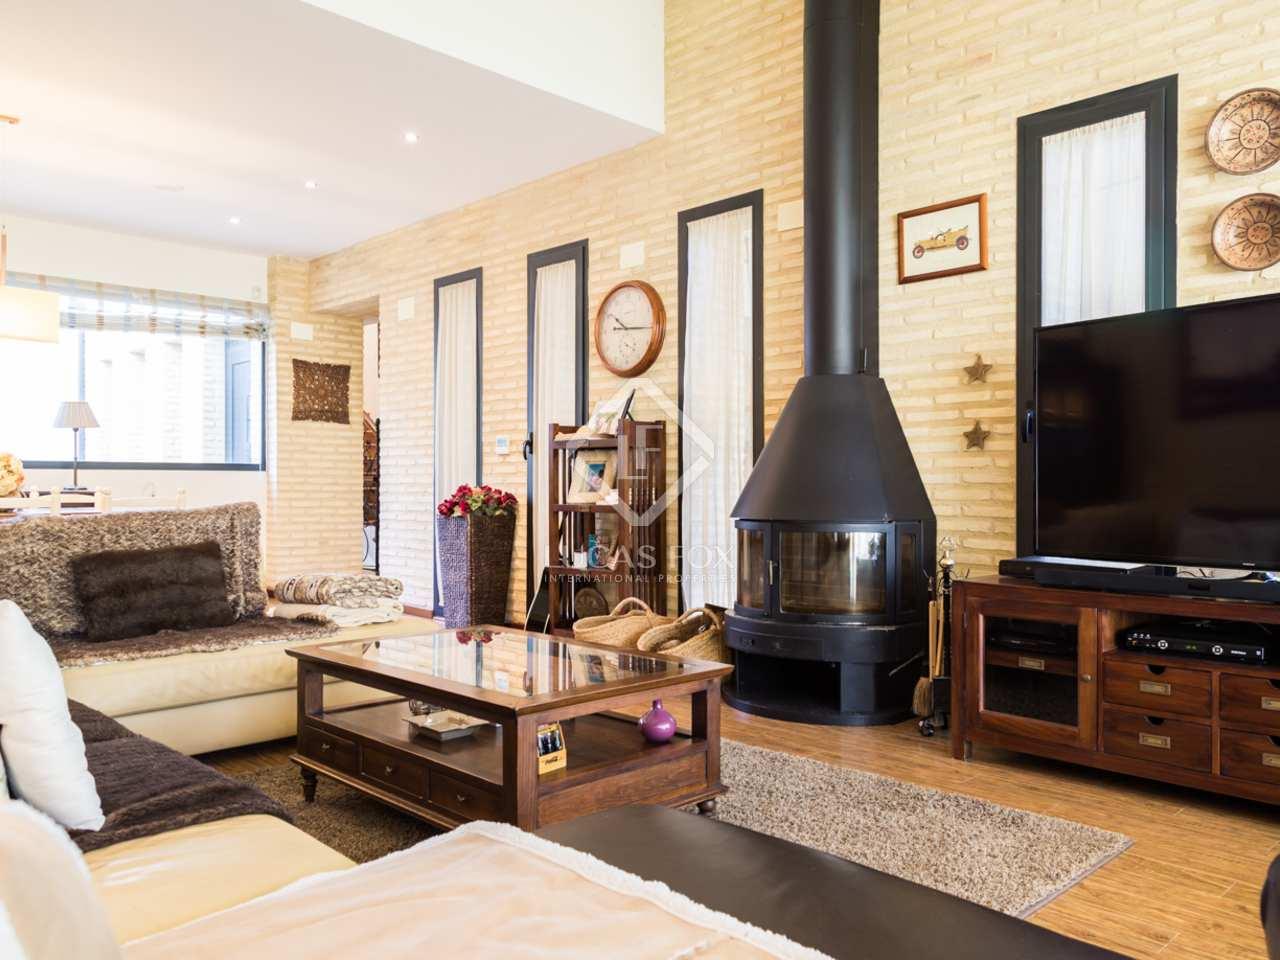 Mediterranean Style Villa For Sale In Exclusive Monasterios: mediterranean home decor for sale